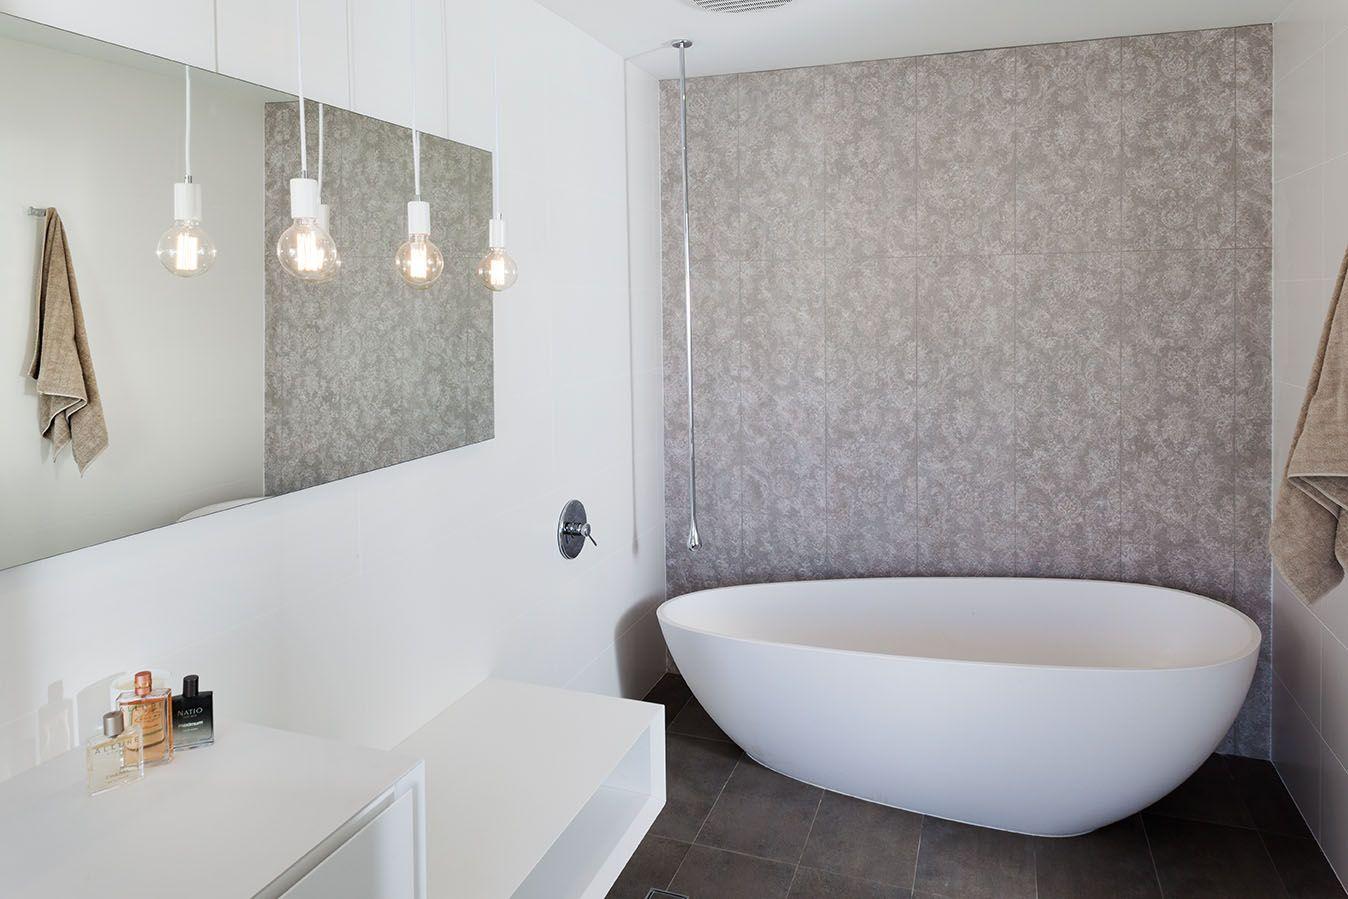 Ceramo's Florencia Natural Feature Tile & Denver Grey Floor Tile | Client Home Specified by Retreat Design